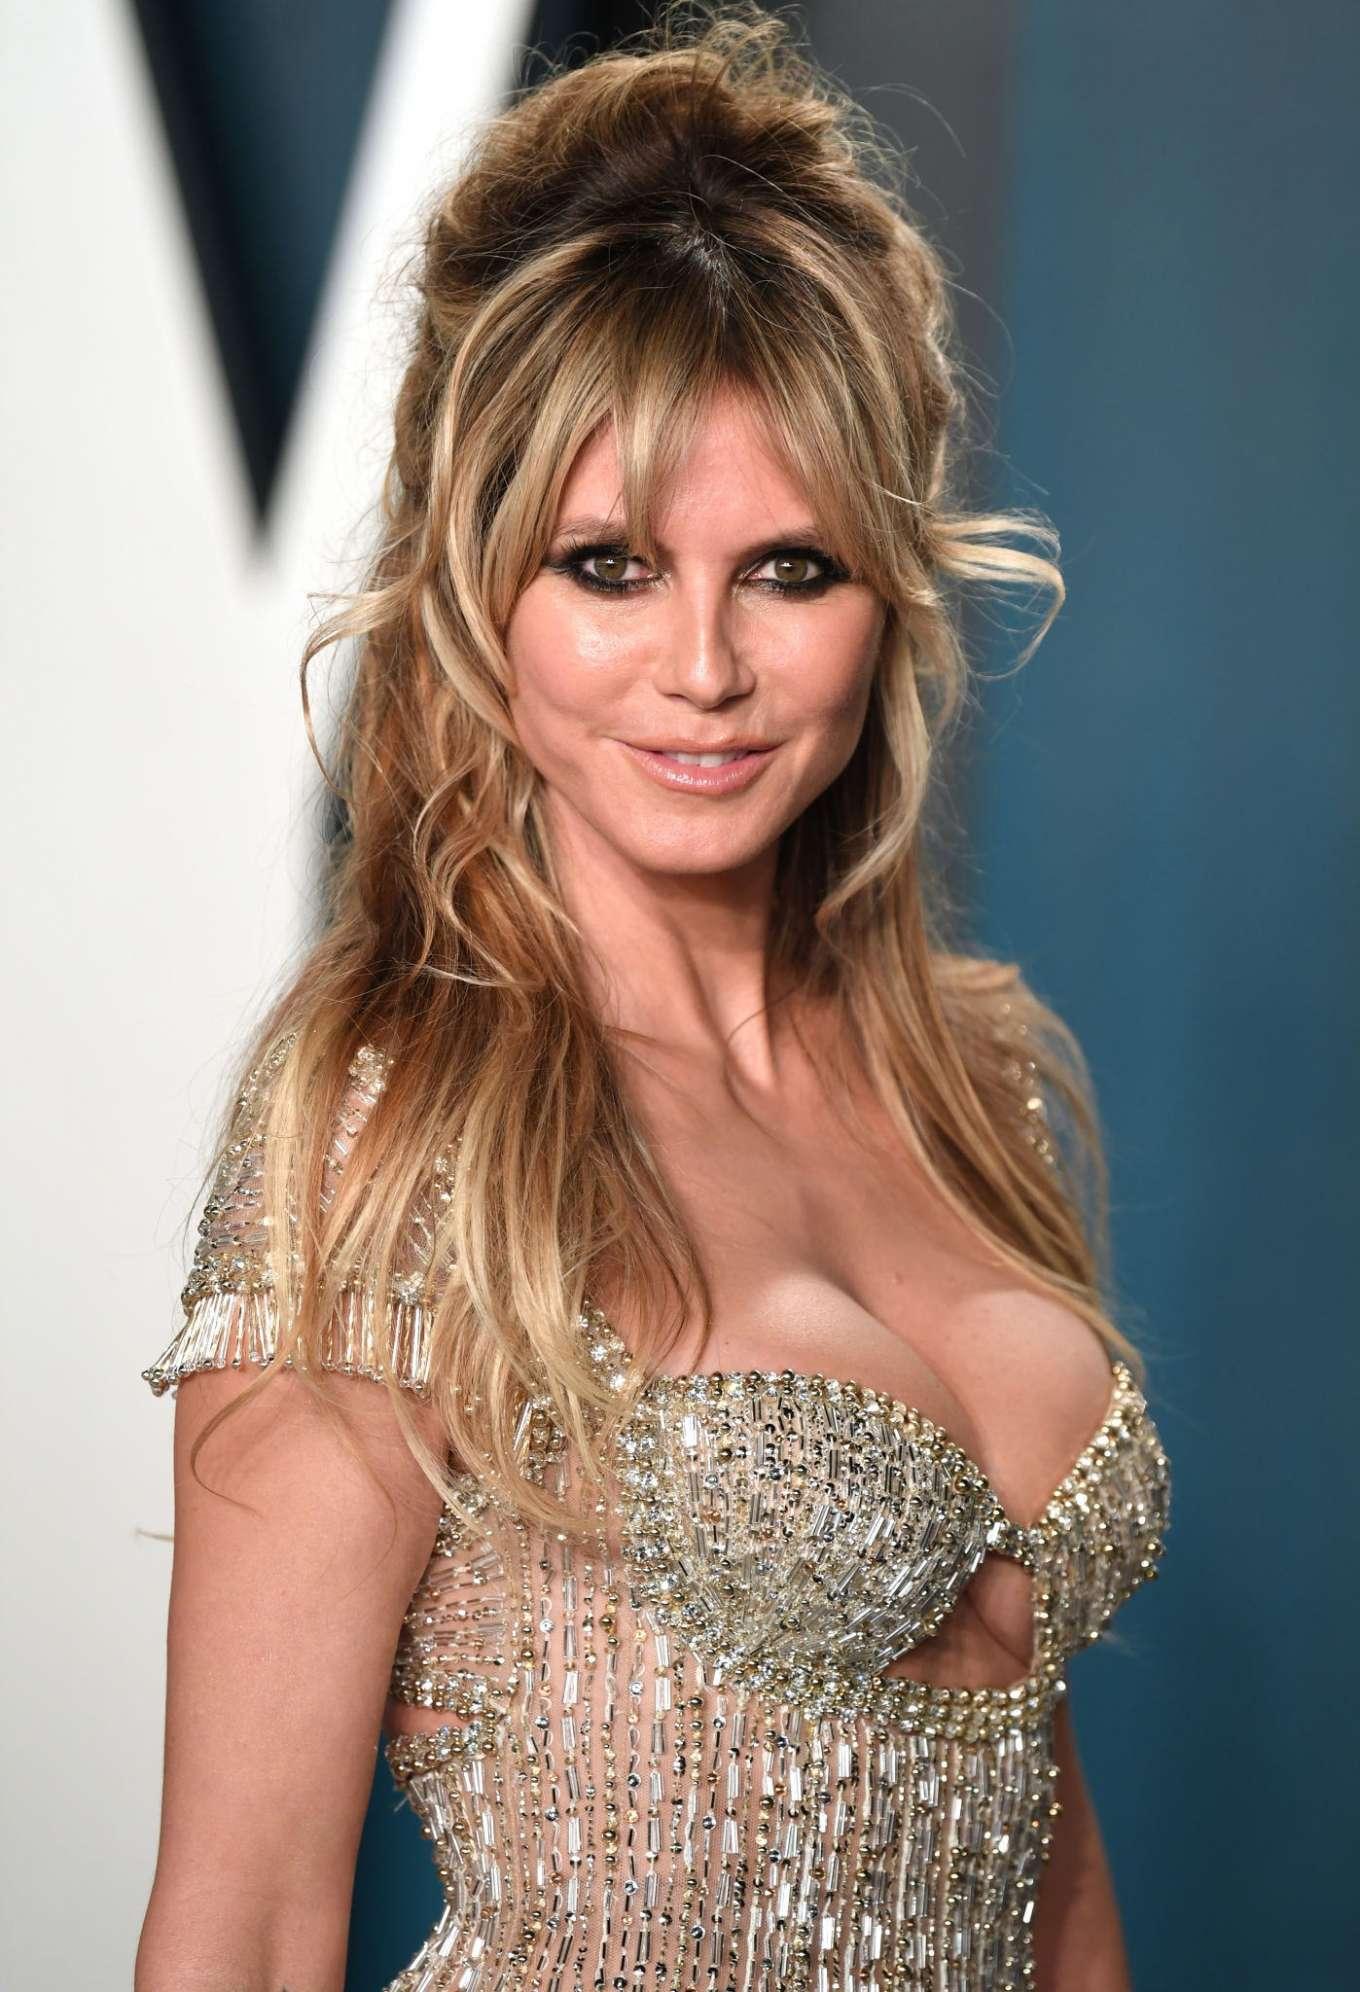 Heidi Klum - 2020 Vanity Fair Oscar Party in Beverly Hills